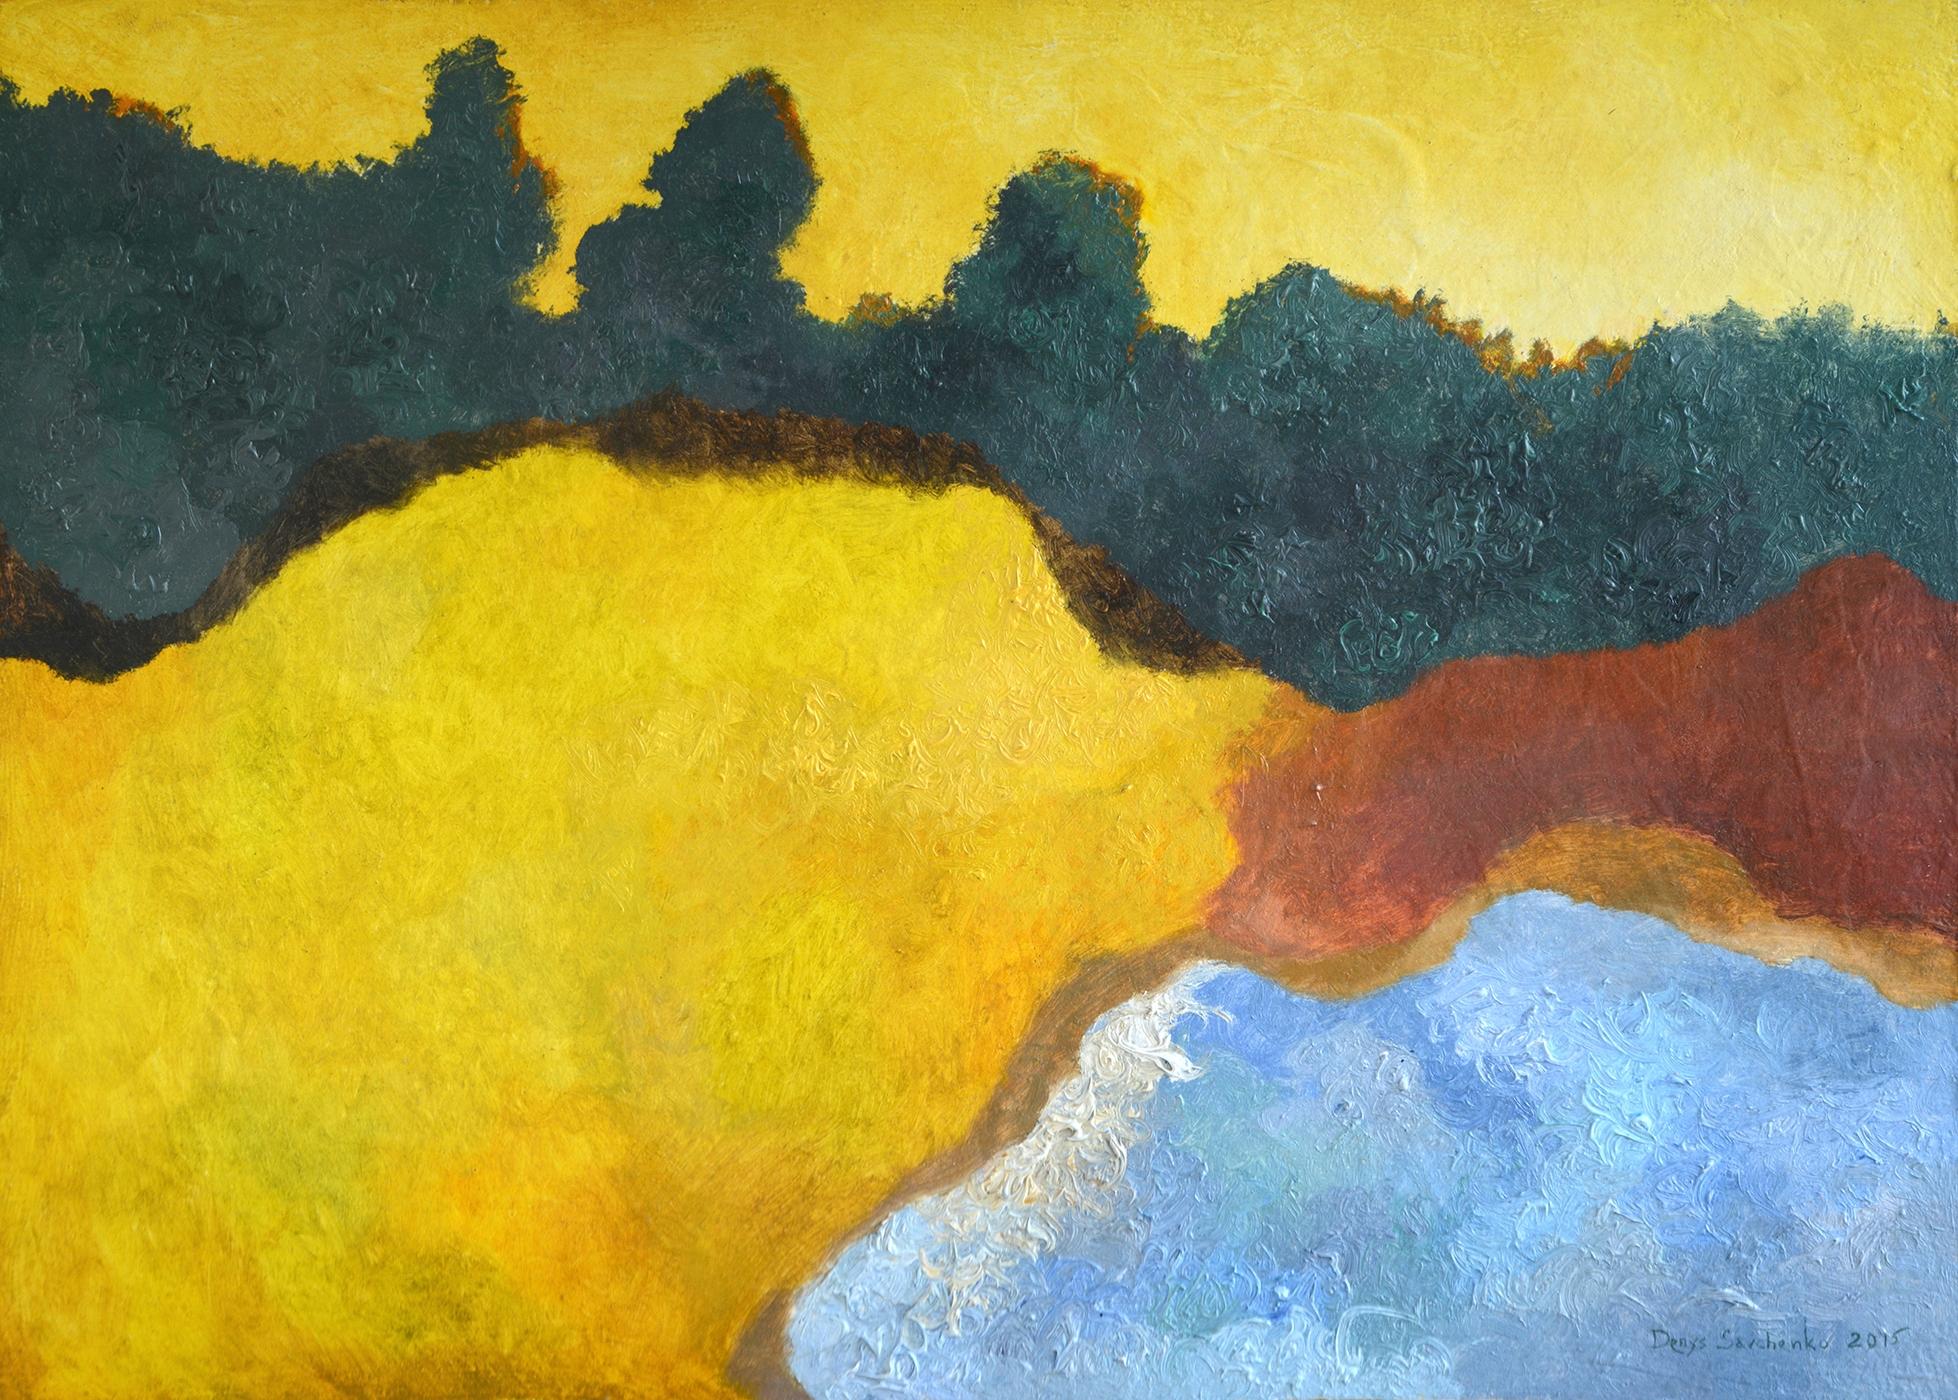 Denys Savchenko. Oil painting. Golden evening. Oil on wooden board.